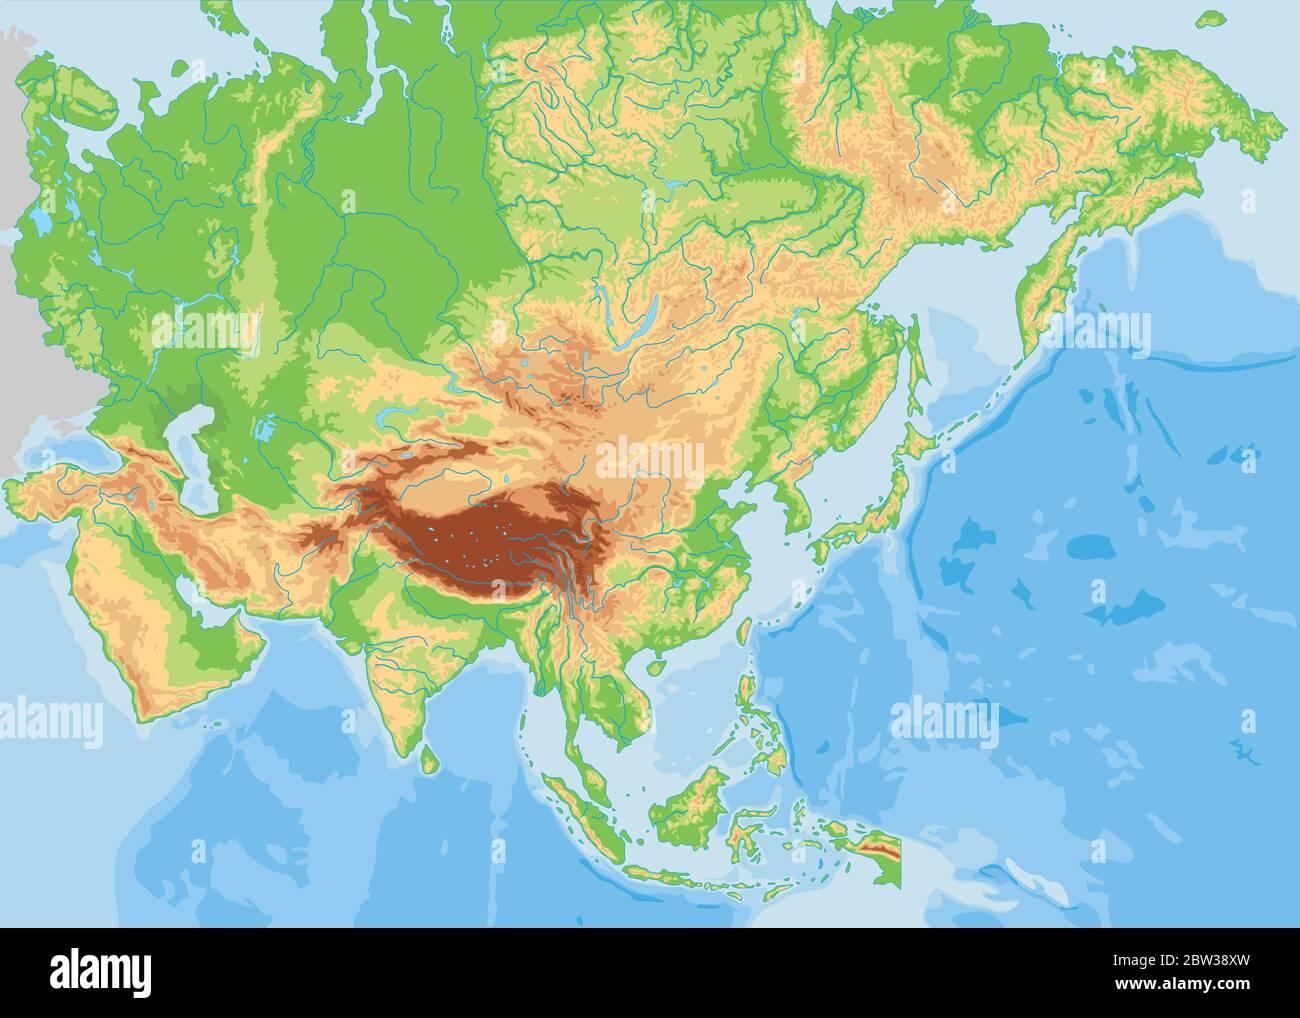 Cartina Asia Fisica.High Detailed Asia Physical Map Stock Vector Image Art Alamy